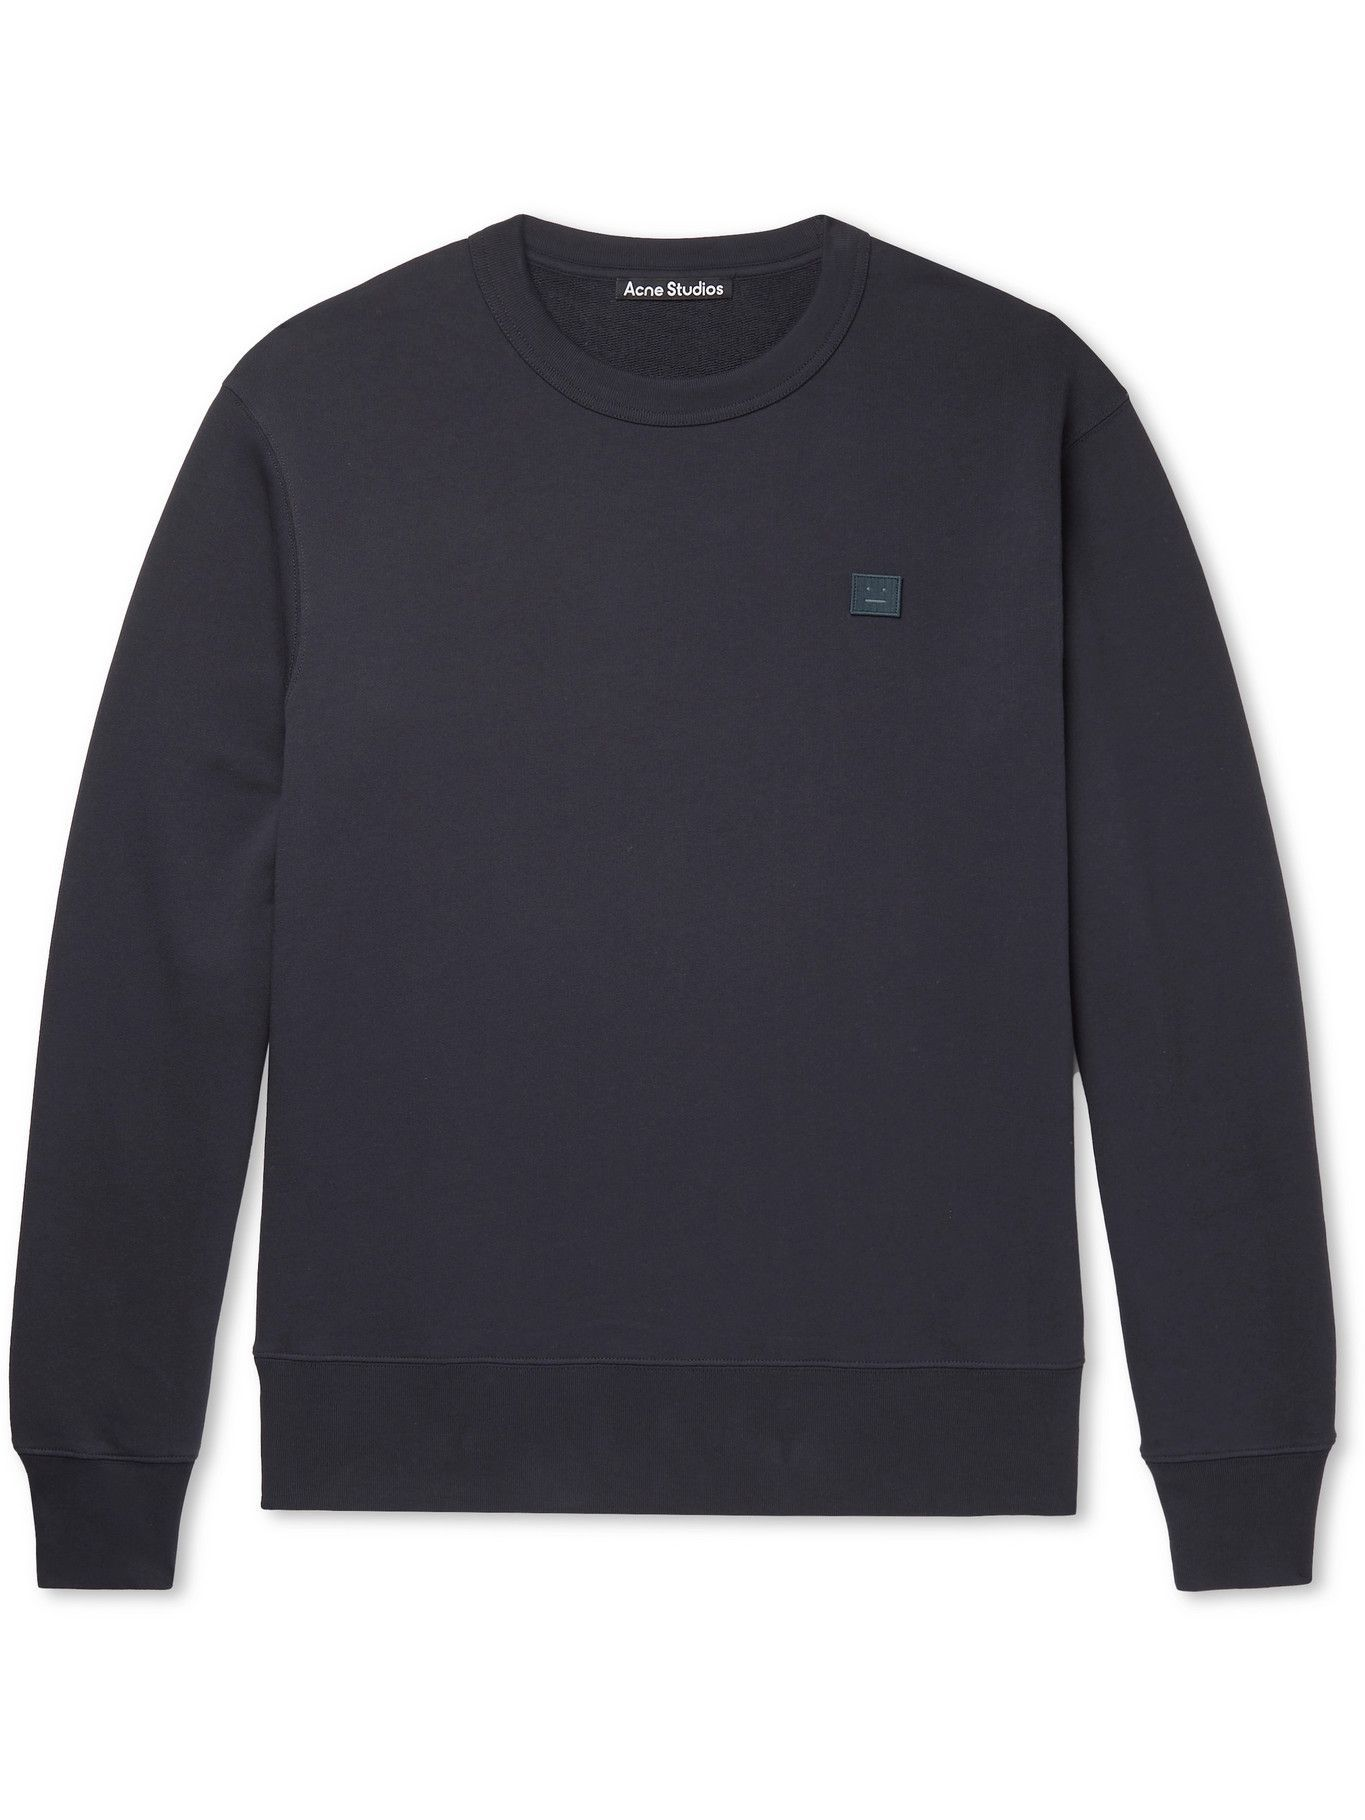 Photo: ACNE STUDIOS - Logo-Appliquéd Organic Cotton-Jersey Sweatshirt - Blue